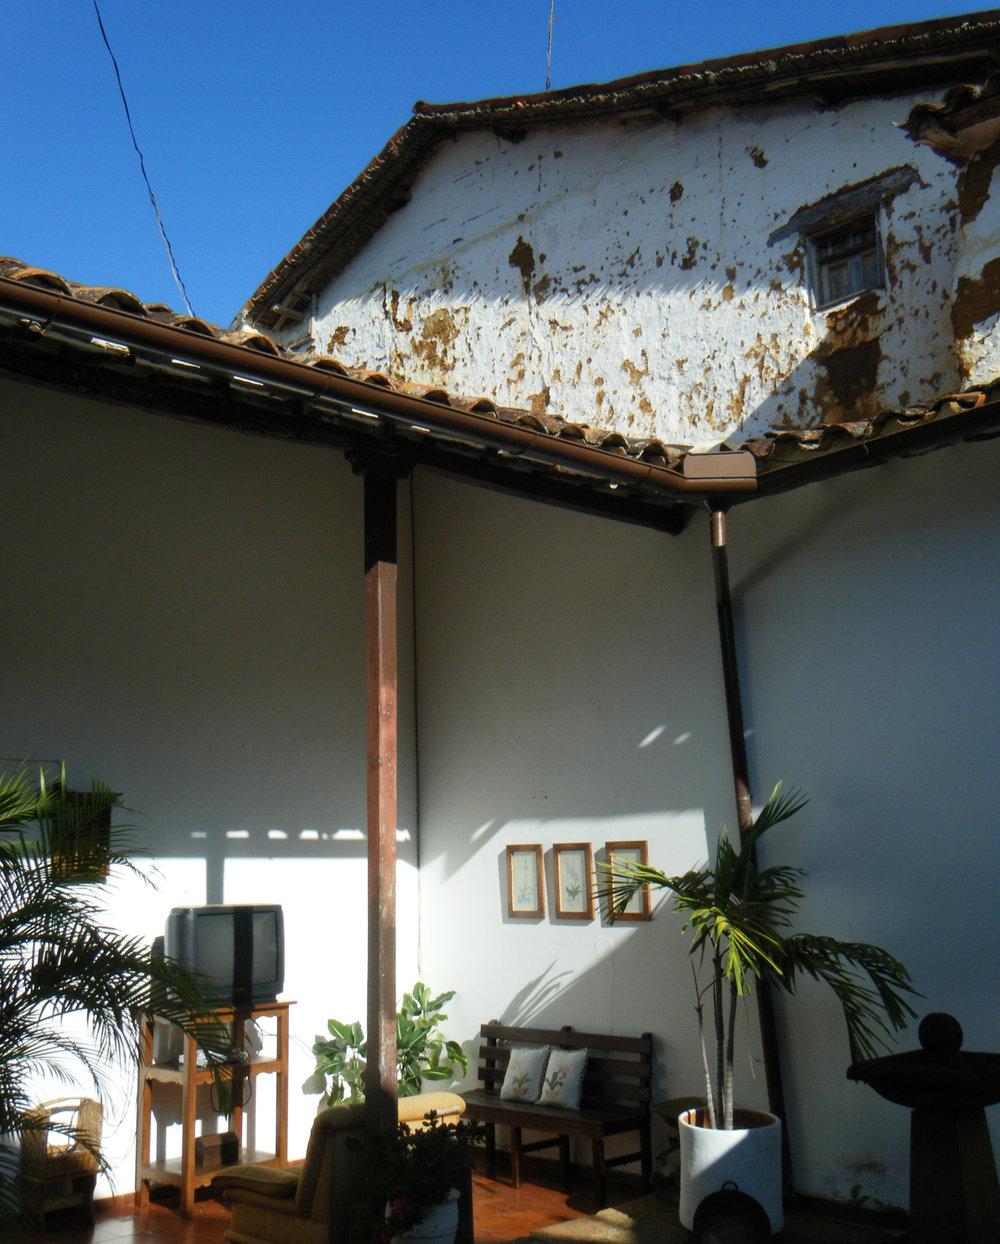 Aposentos Hotel Barichara.jpg